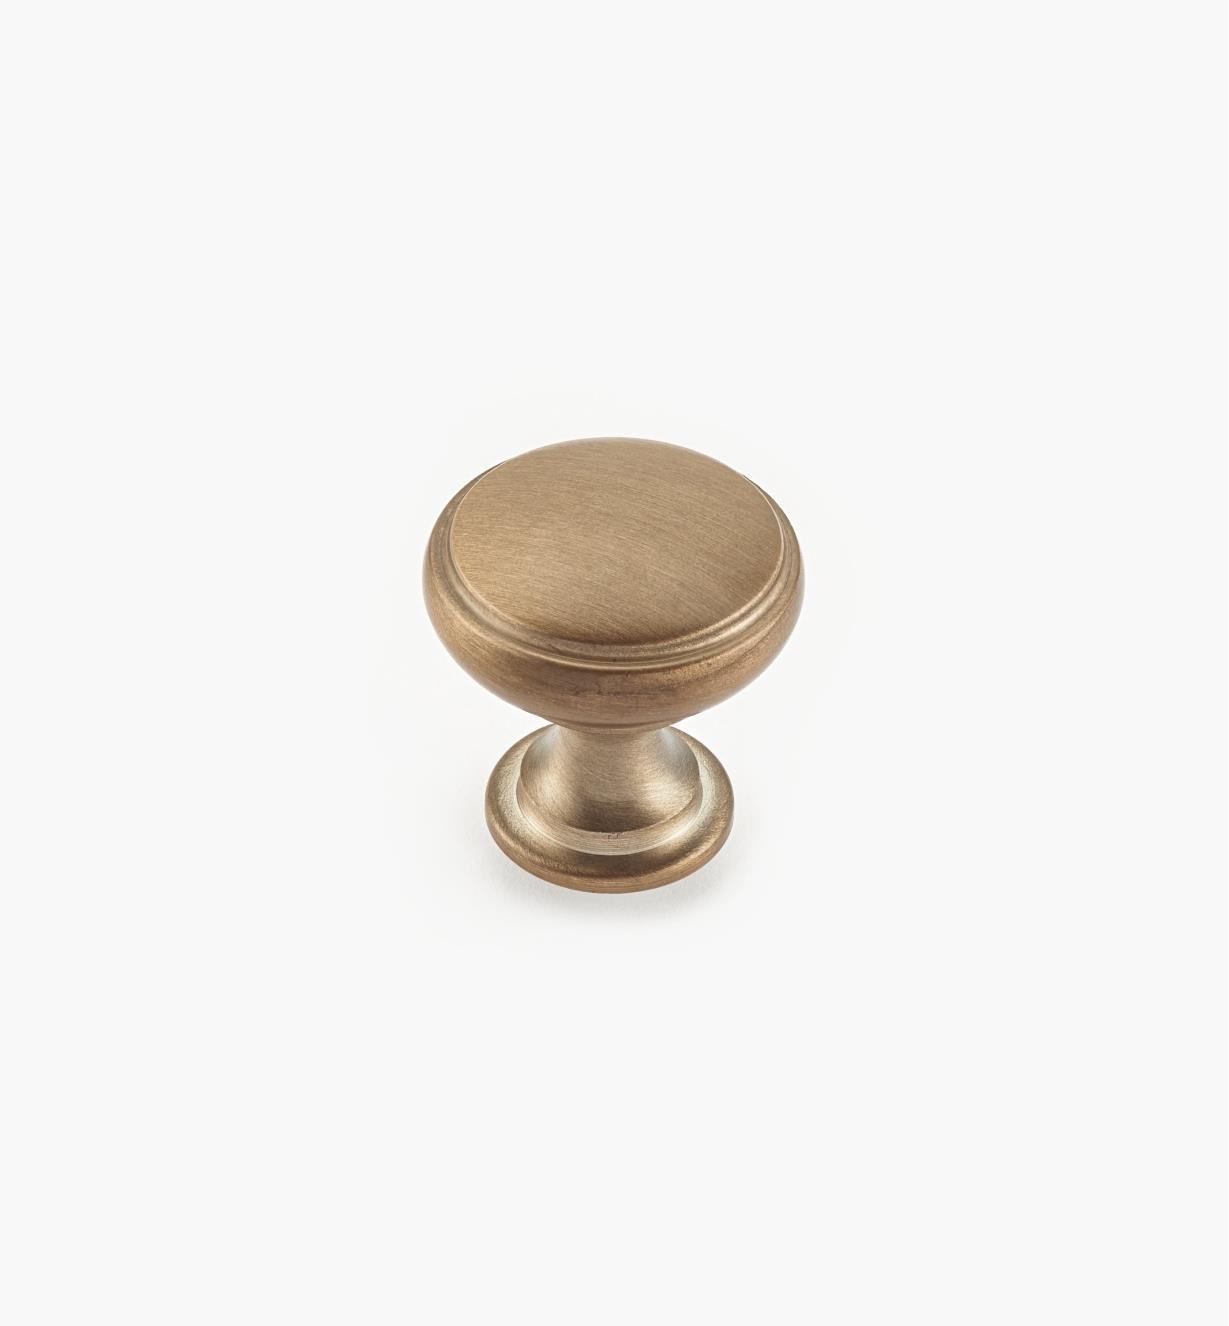 "02W4038 - 1 3/16"" Champagne Gold Knob"